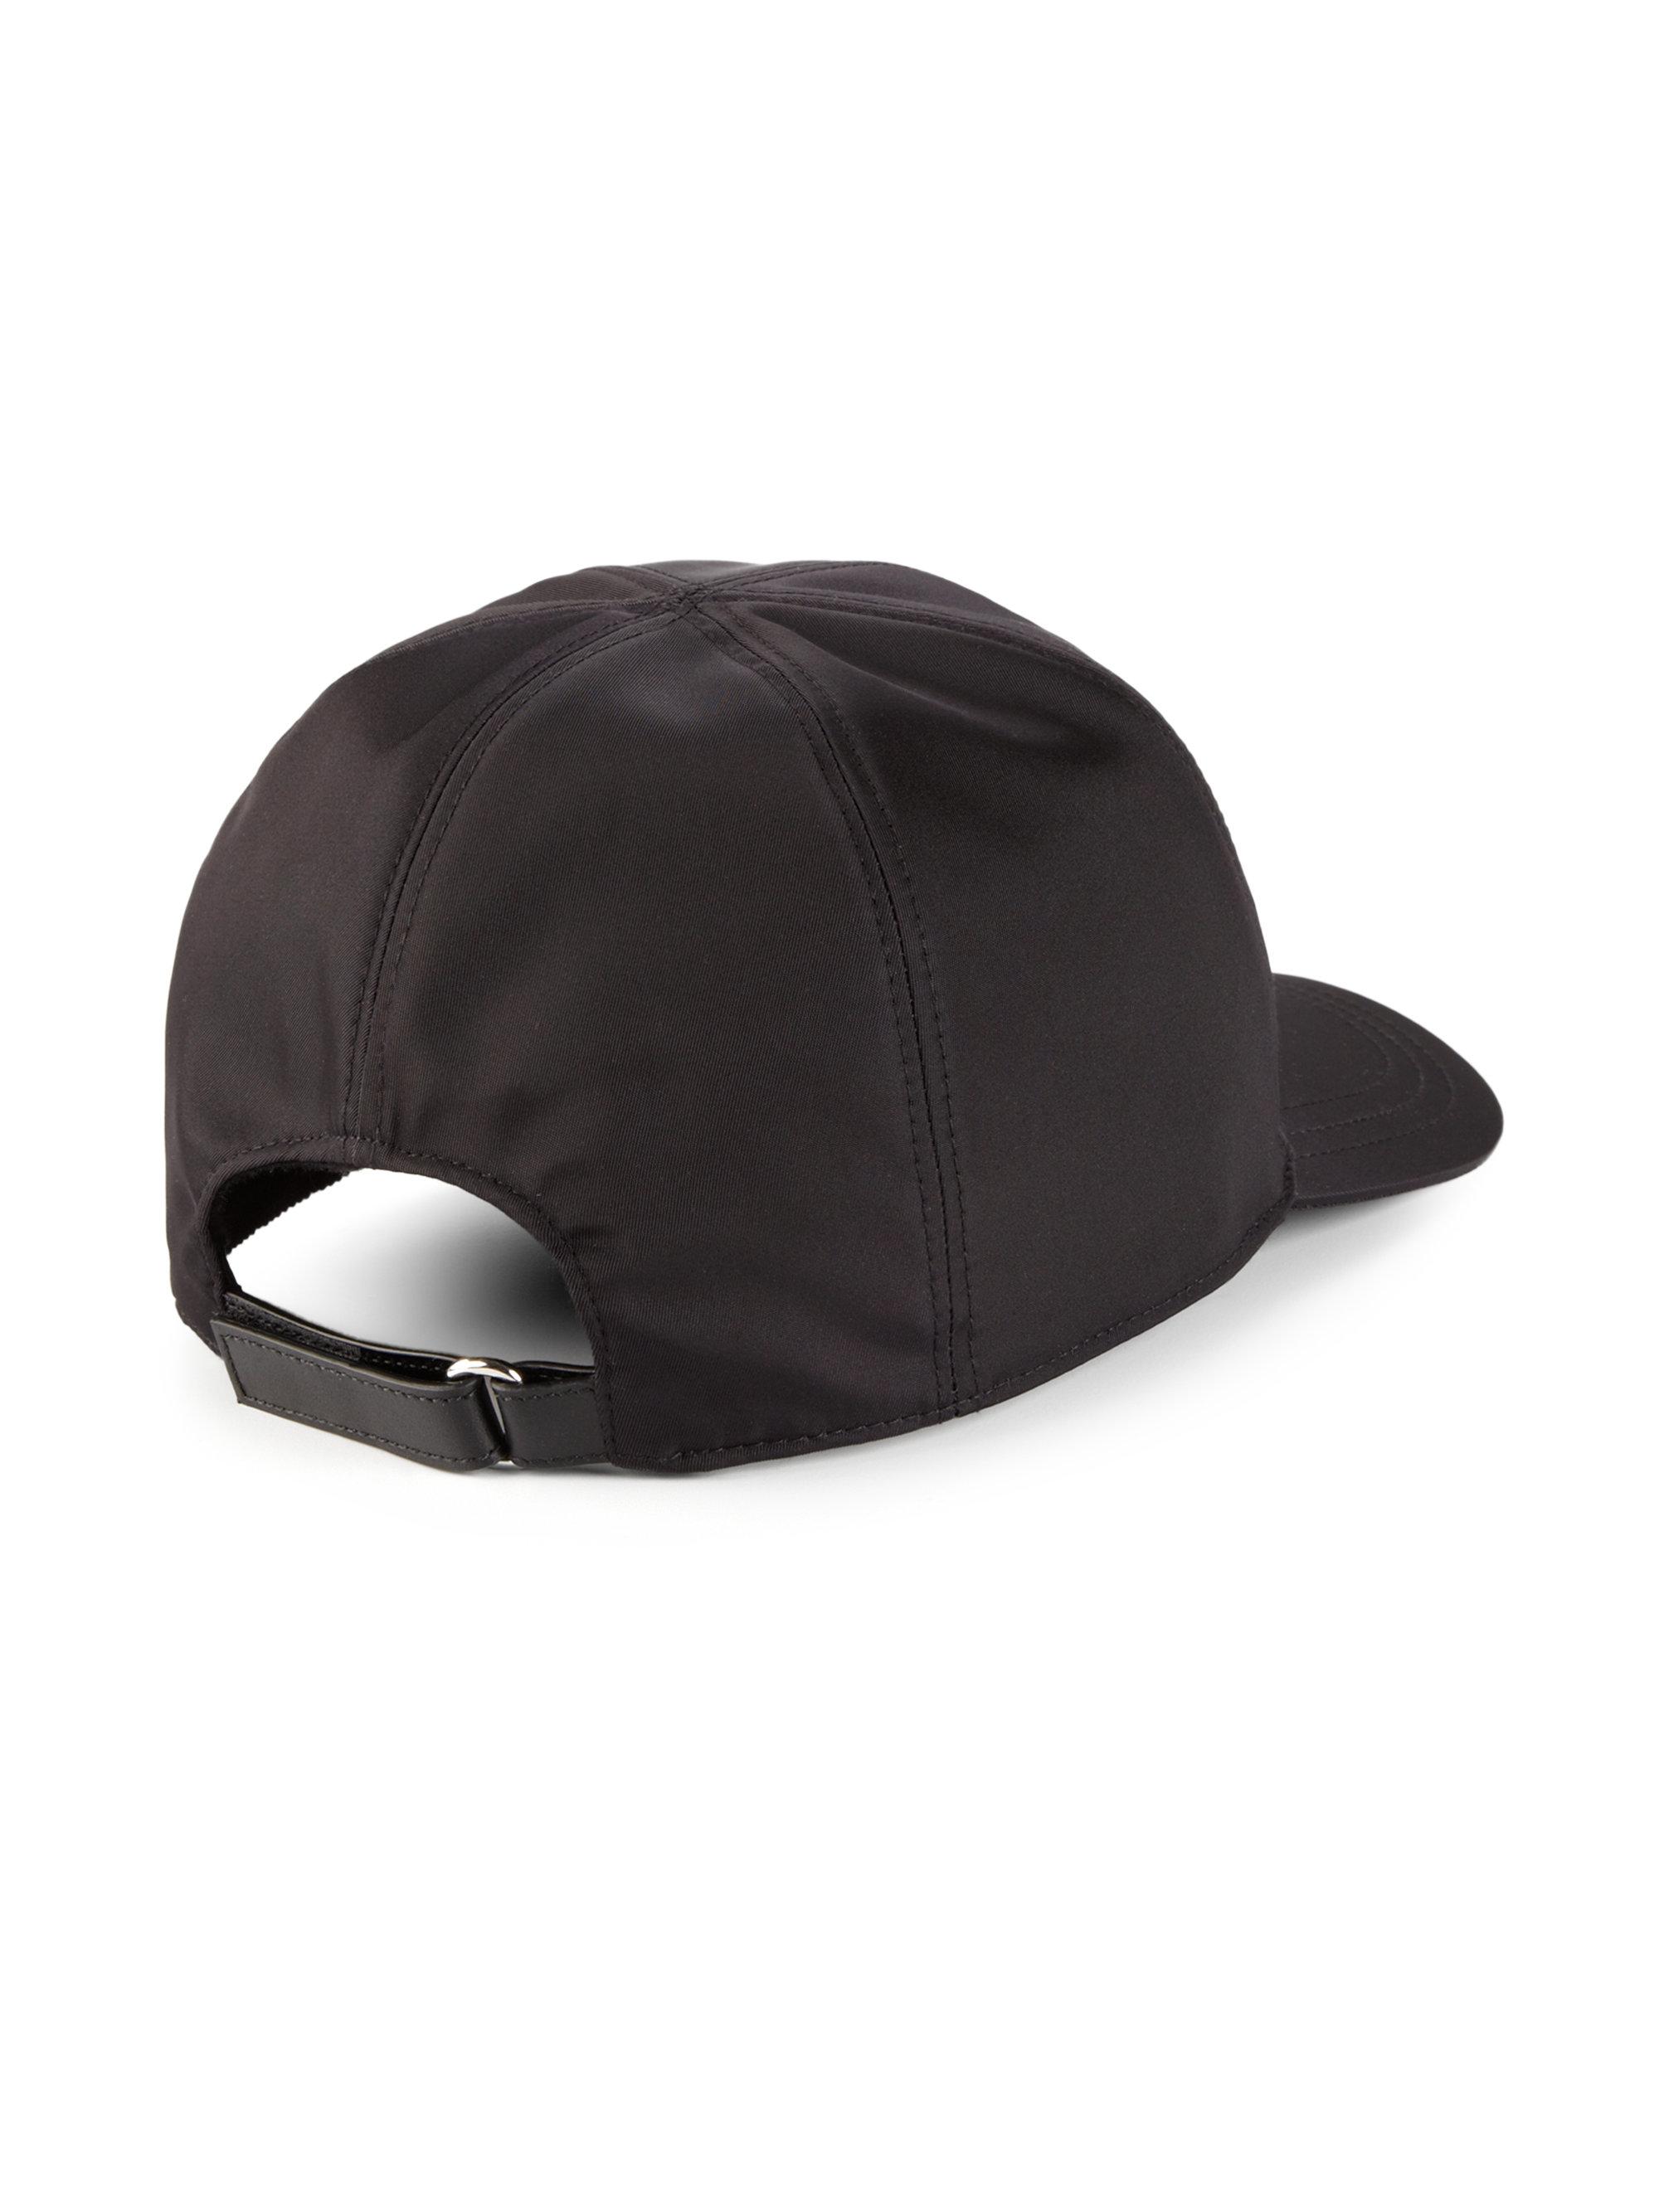 Lyst - Prada Nylon   Calf Leather Baseball Cap in Black for Men 1f4b735c156